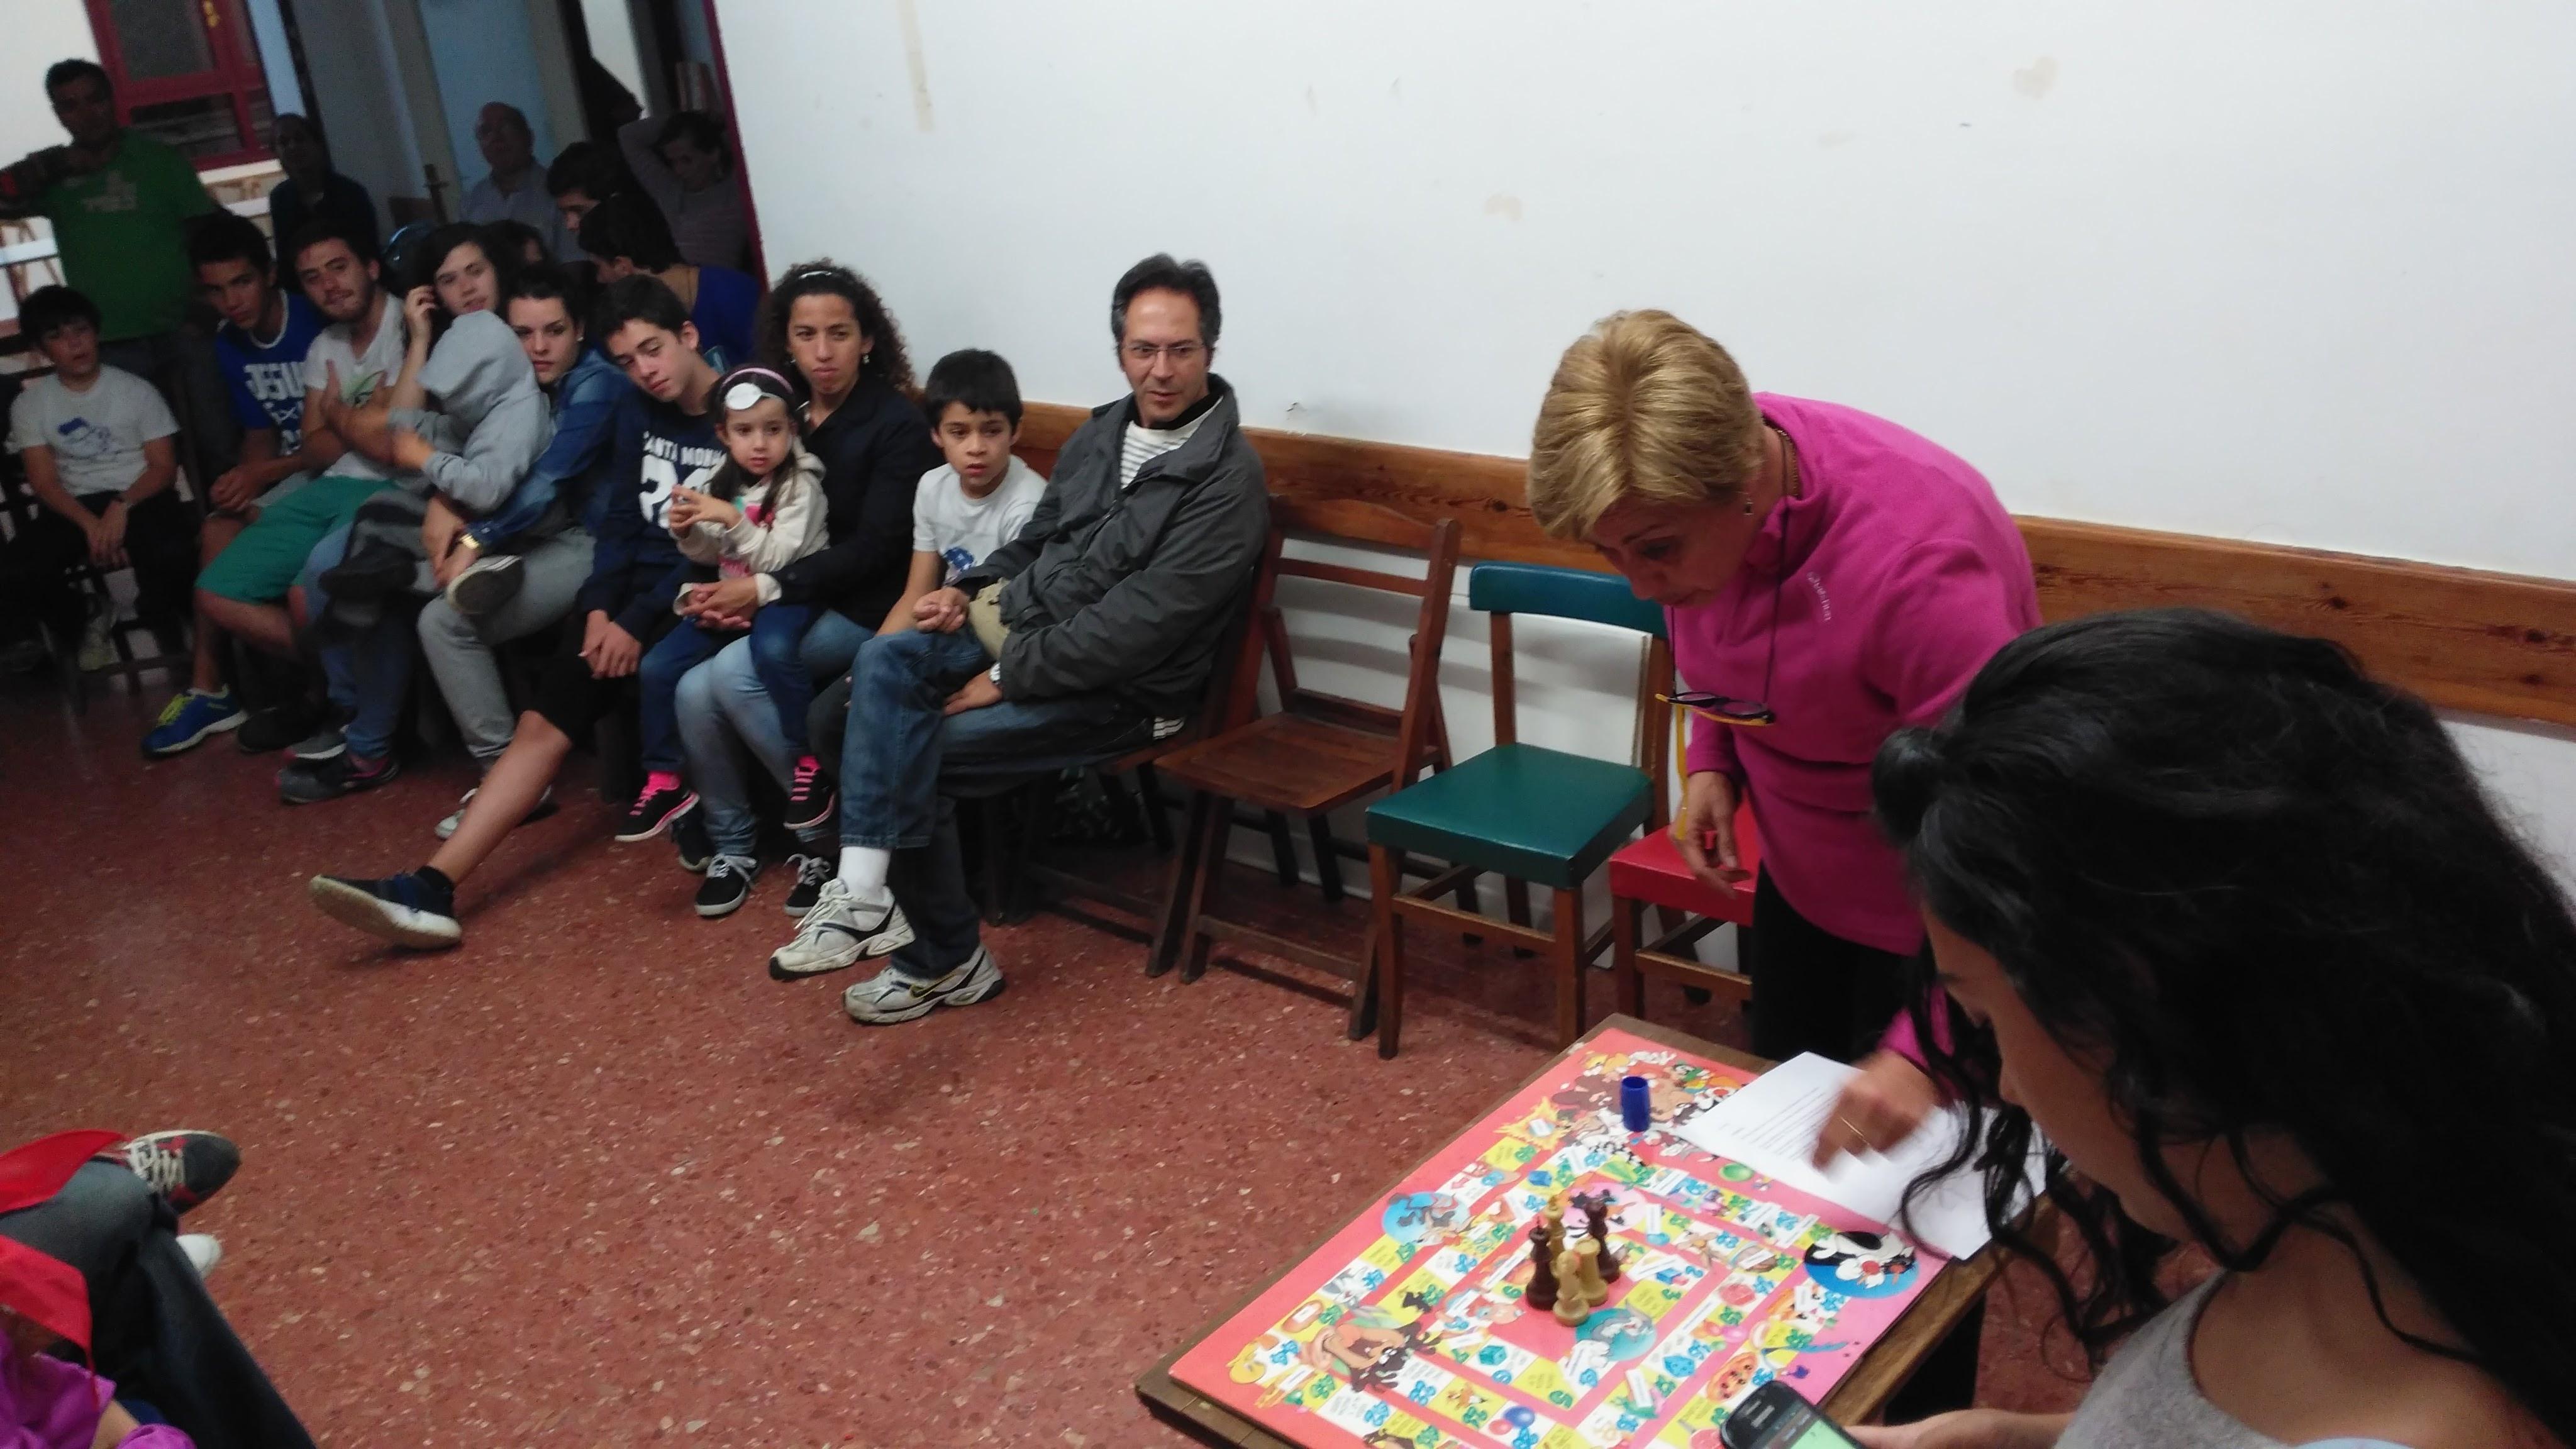 Picasa - 2015.09.12-13 - Convivencia Sector Familias(22).jpg